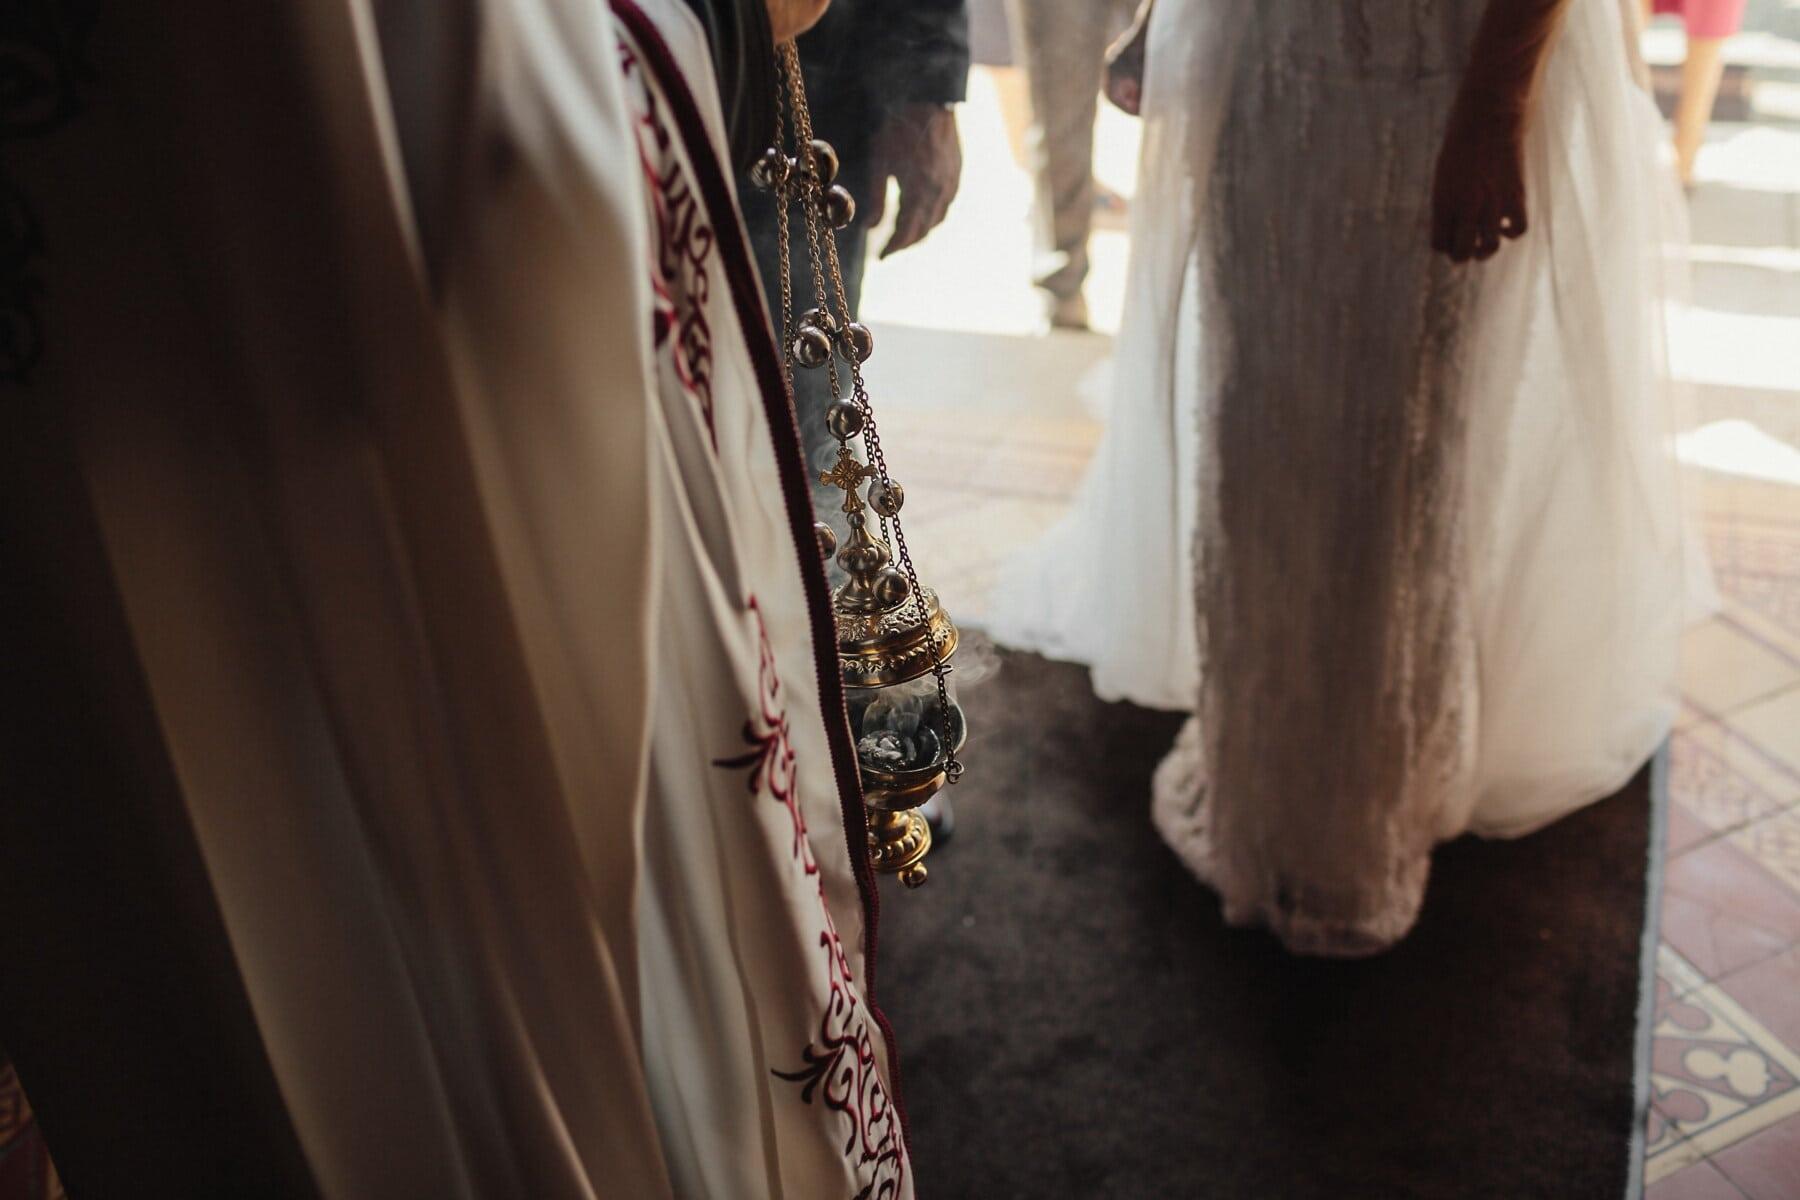 priest, orthodox, ceremony, bride, religious, wedding dress, wedding, people, street, woman